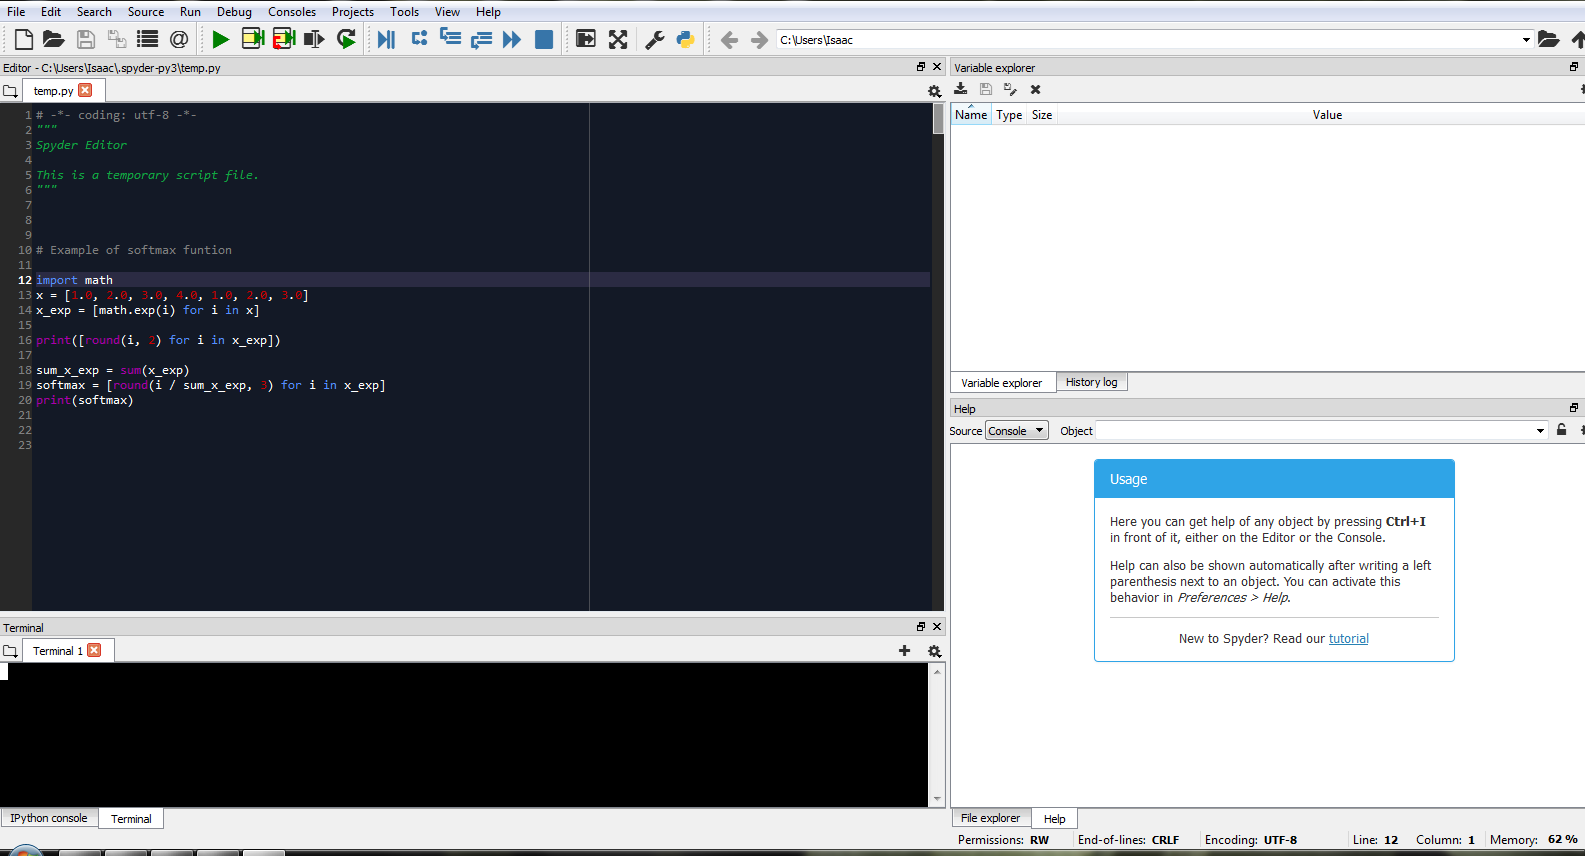 Terminal hangs in Windows · Issue #121 · spyder-ide/spyder-terminal